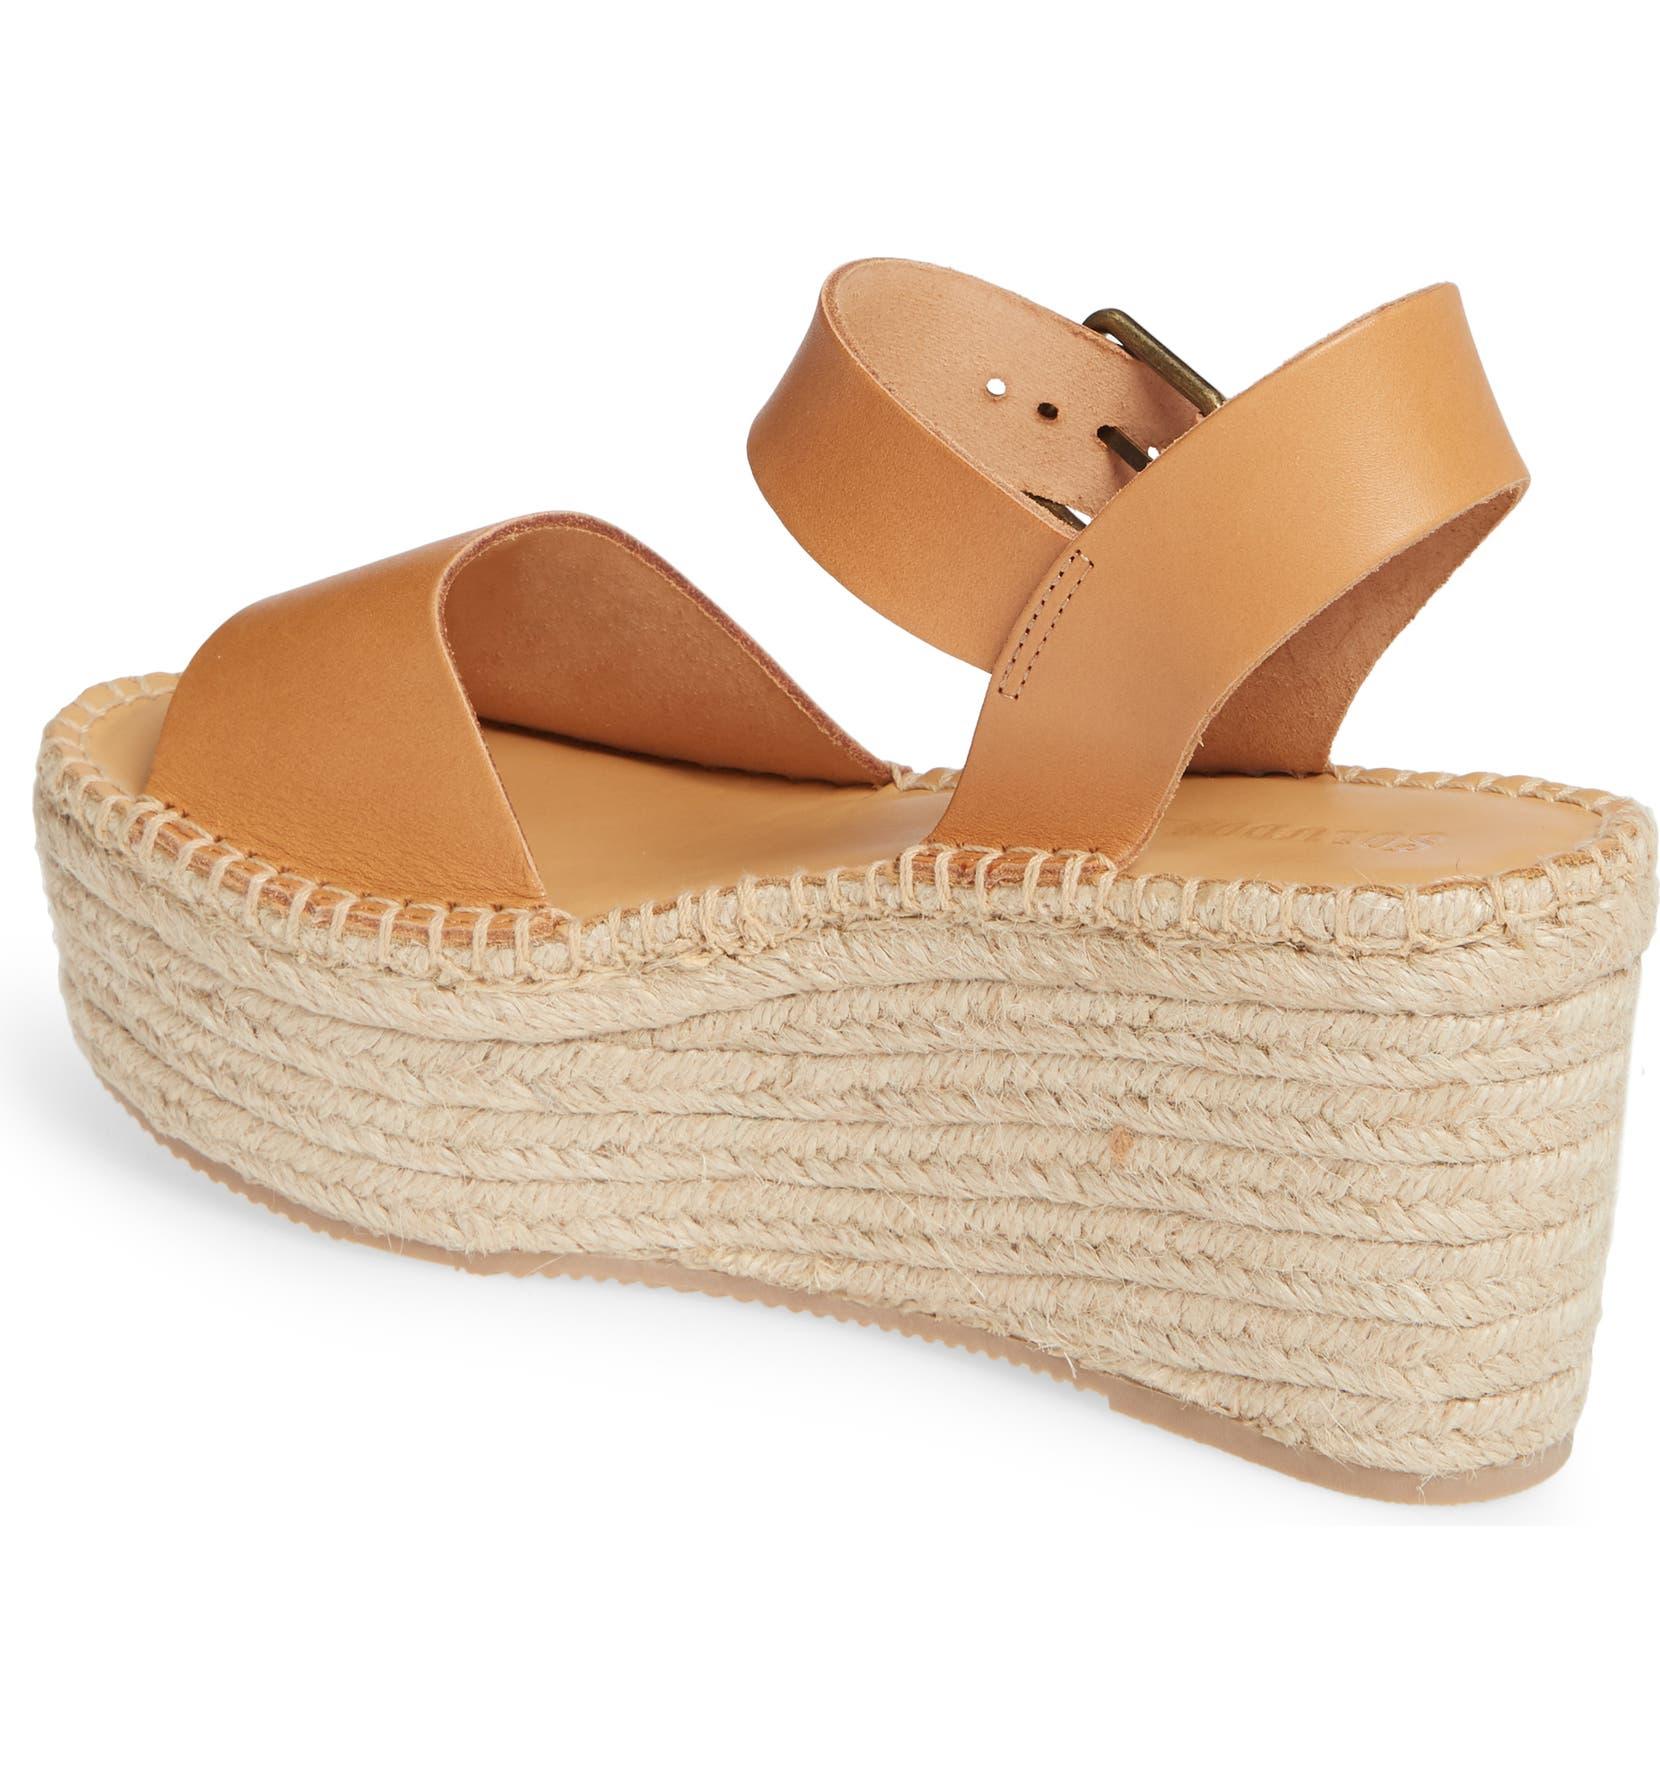 b57a044bbaf3 Soludos Minorca Platform Wedge Sandal (Women)